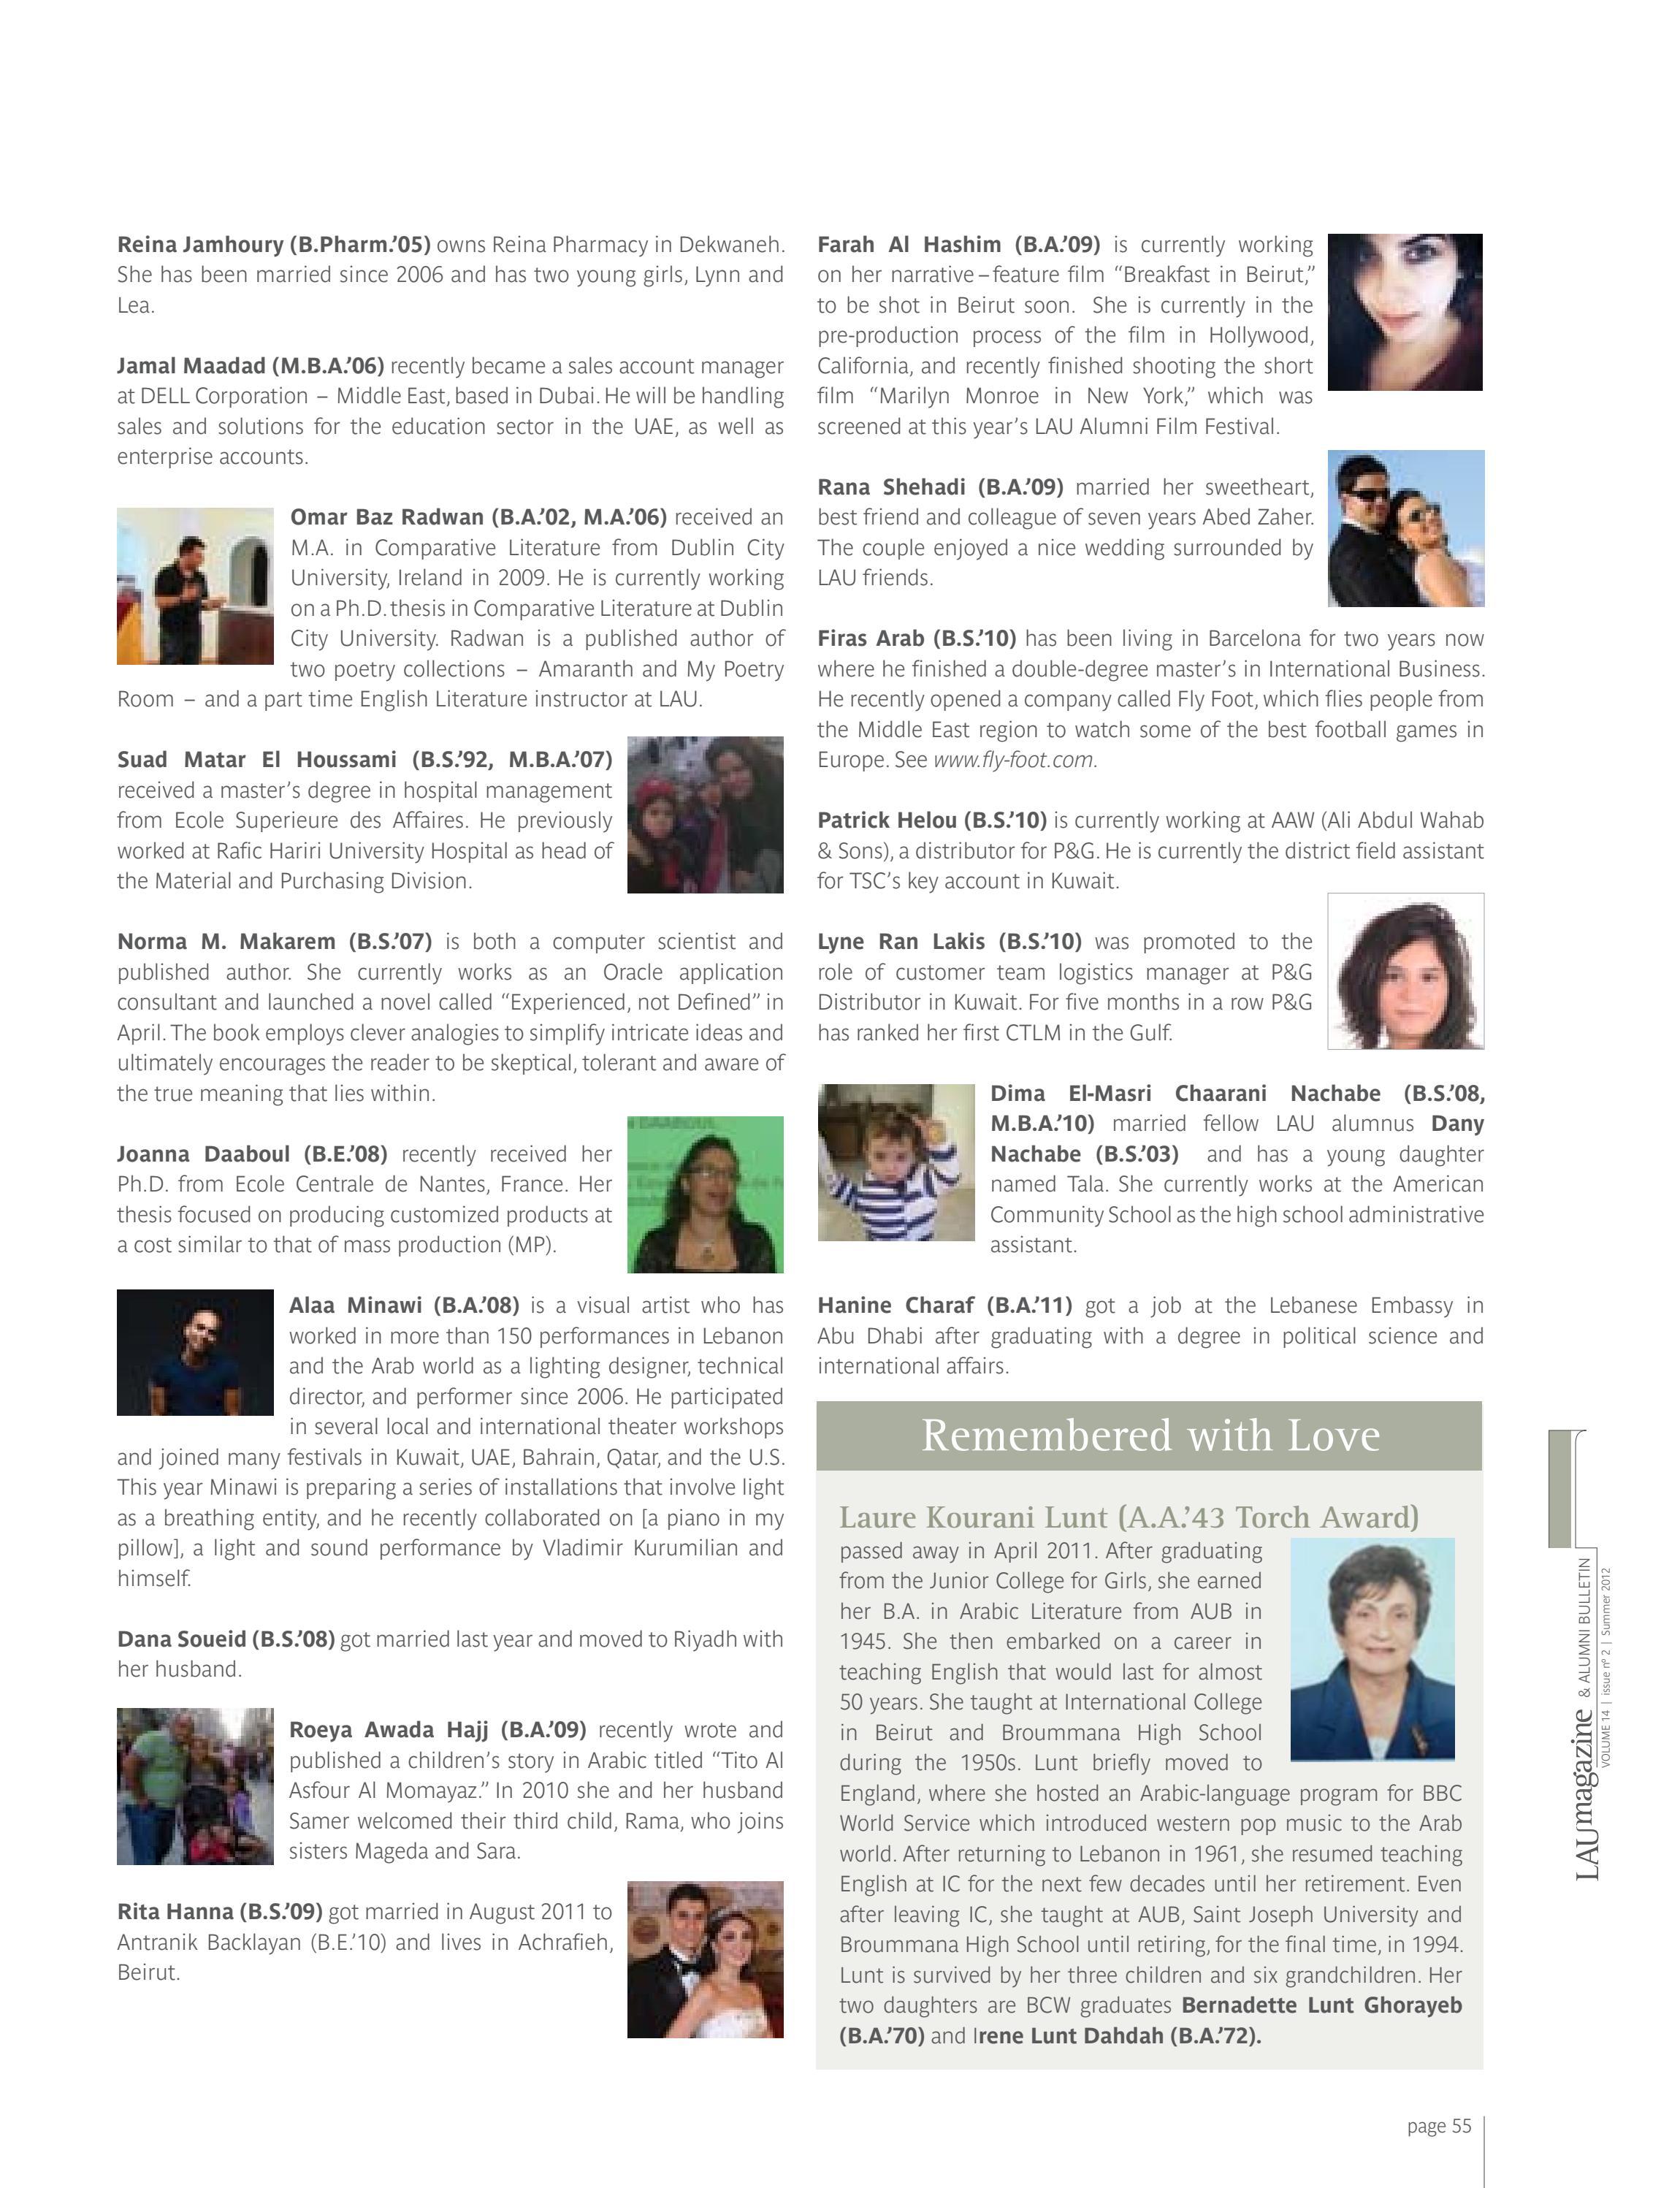 LAU Magazine & Alumni Bulletin (Summer 2012, Vol  14, Issue no  2